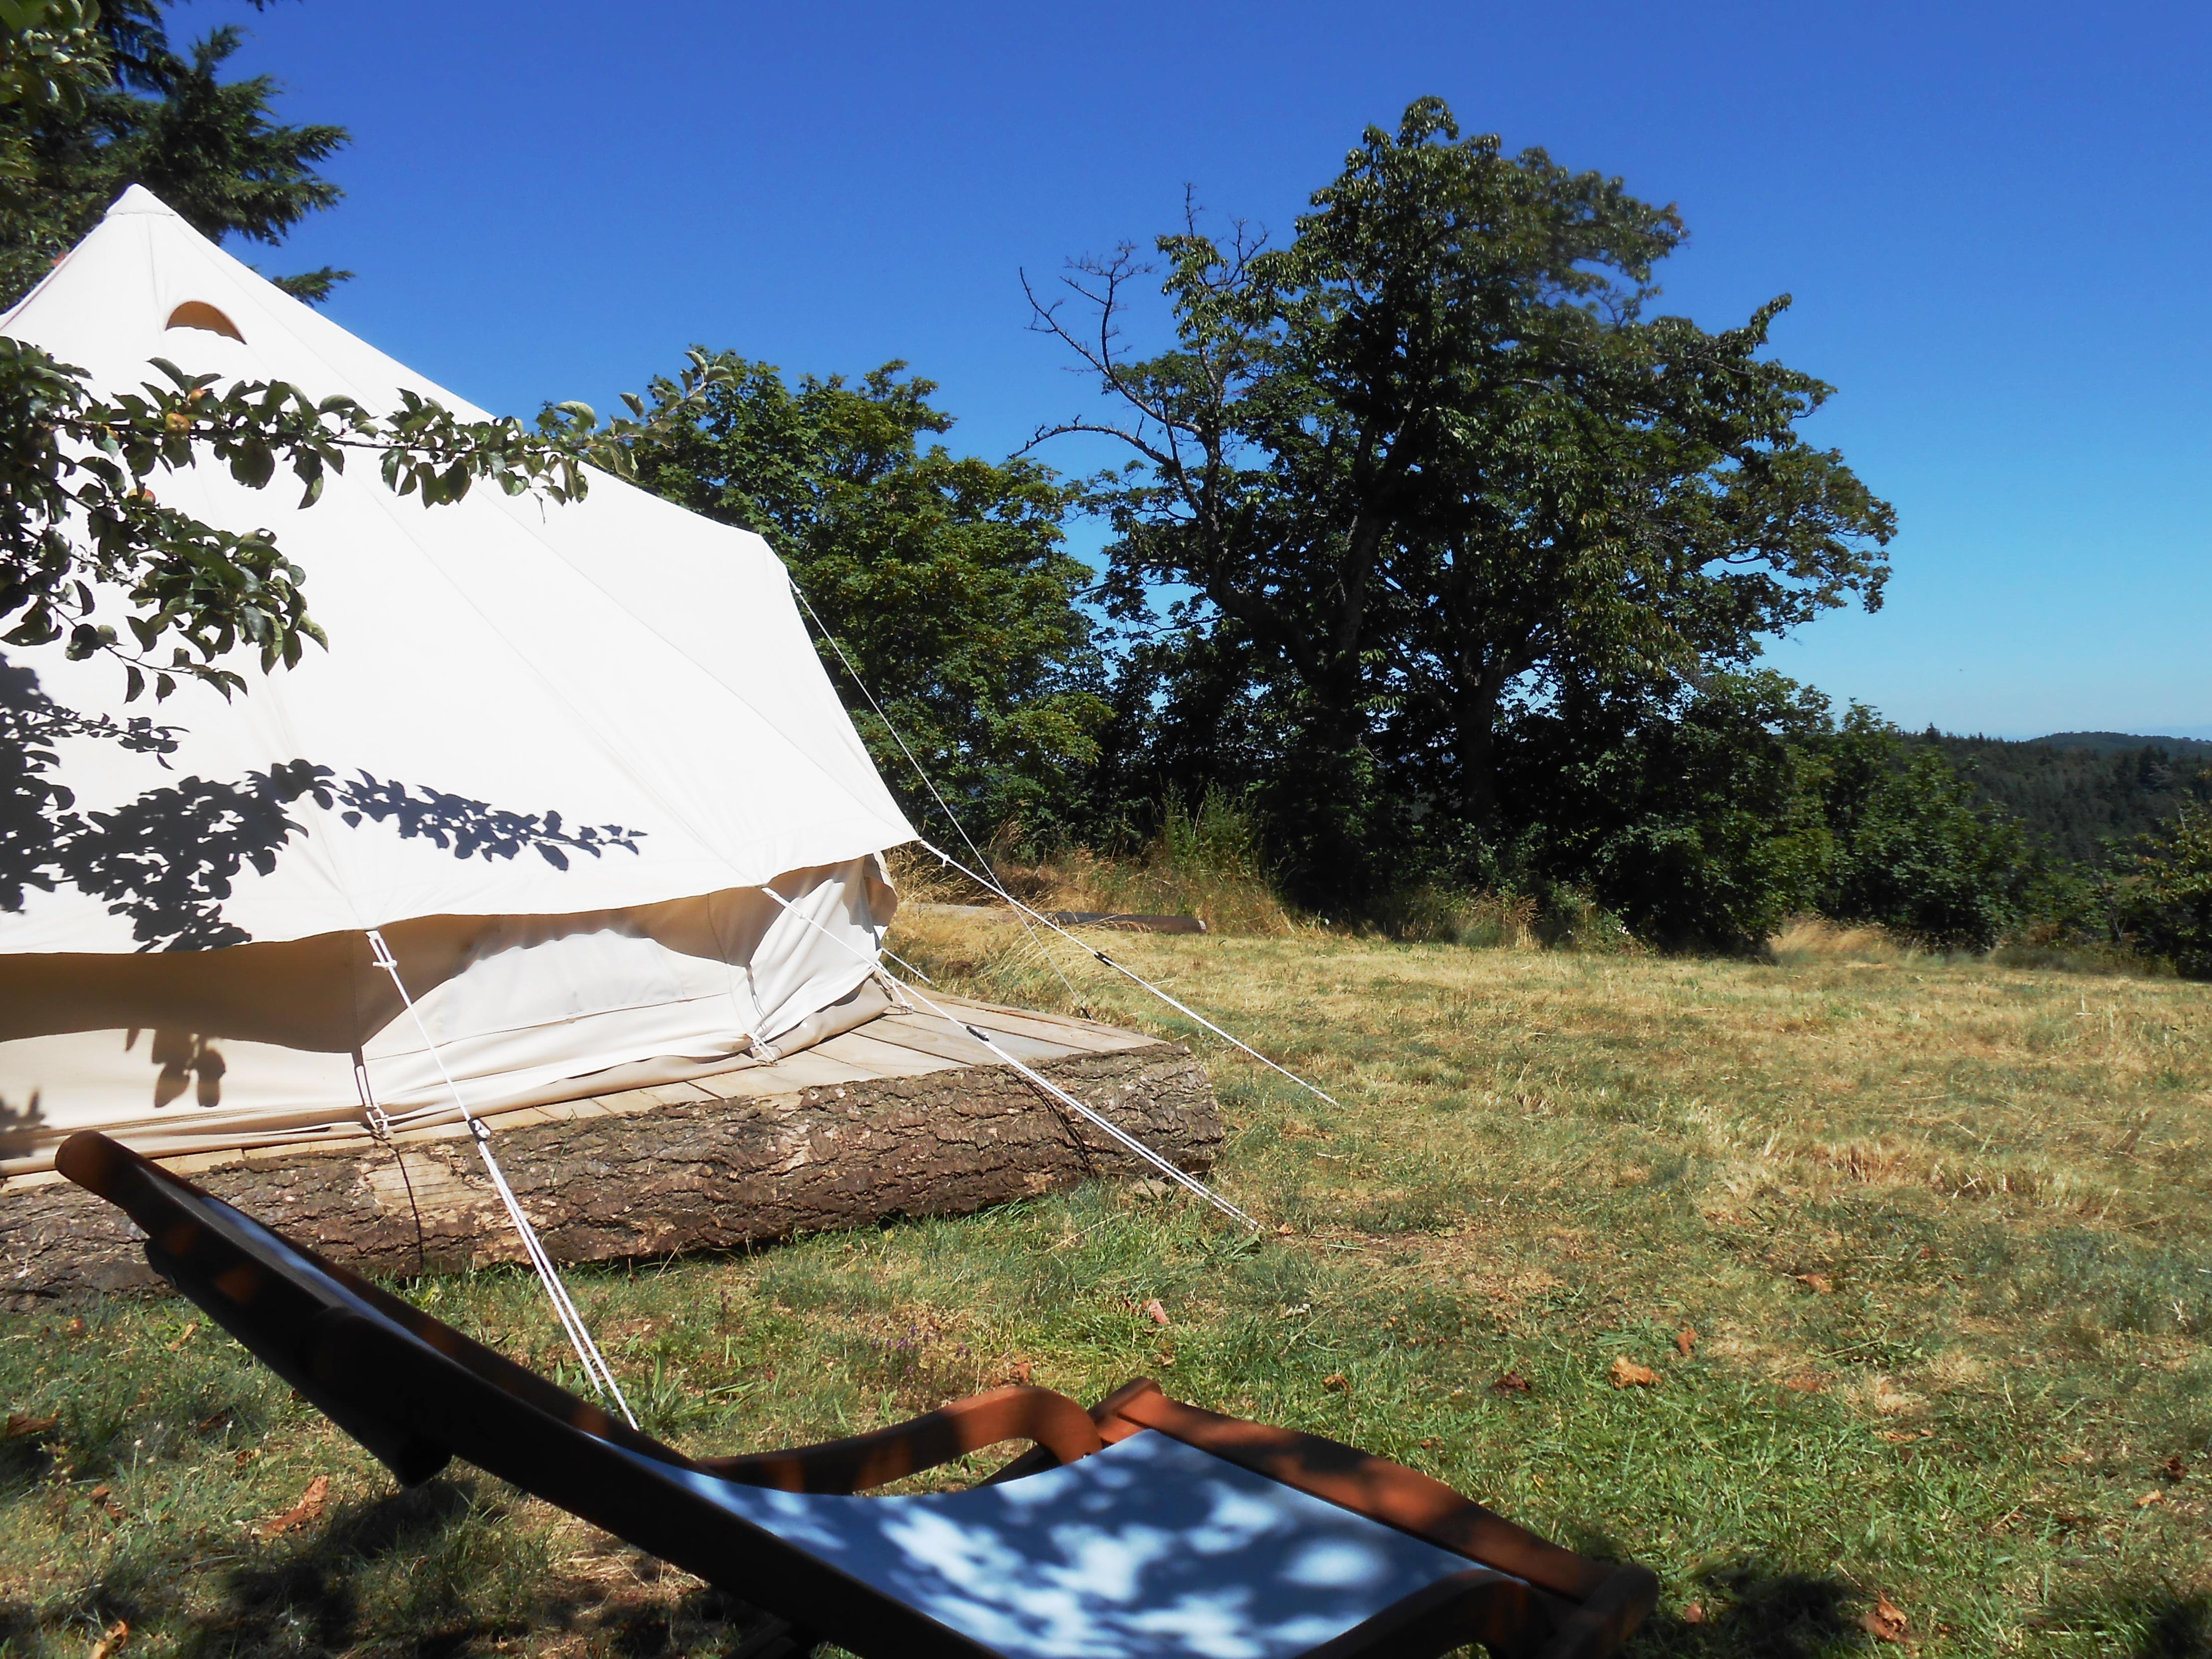 Aparte accommodaties : Les Soleillas - tente saharienne (1-5 pers.)